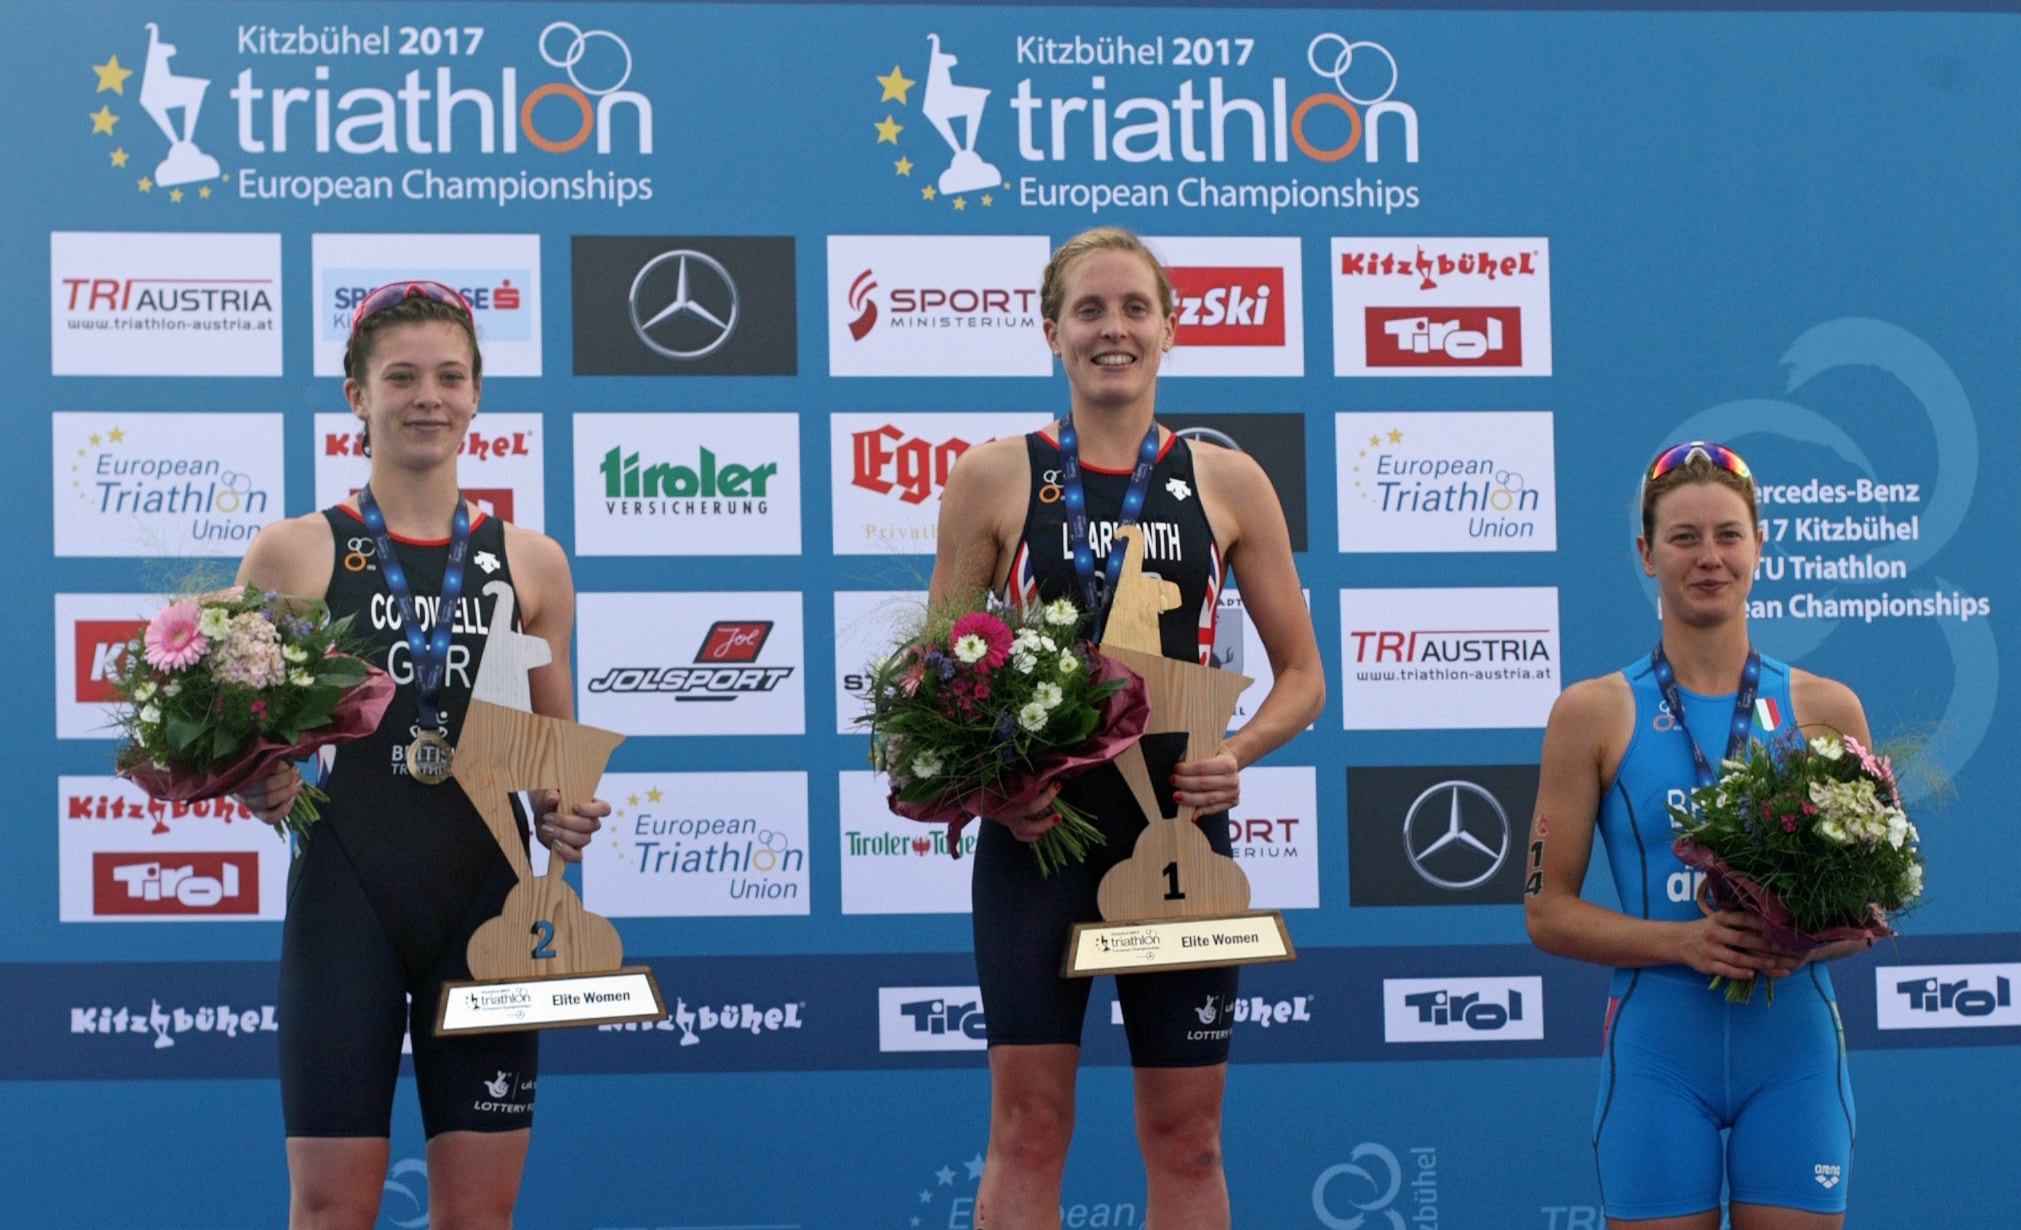 2017-06-16/18 Kitzbühel ETU Triathlon European Championships